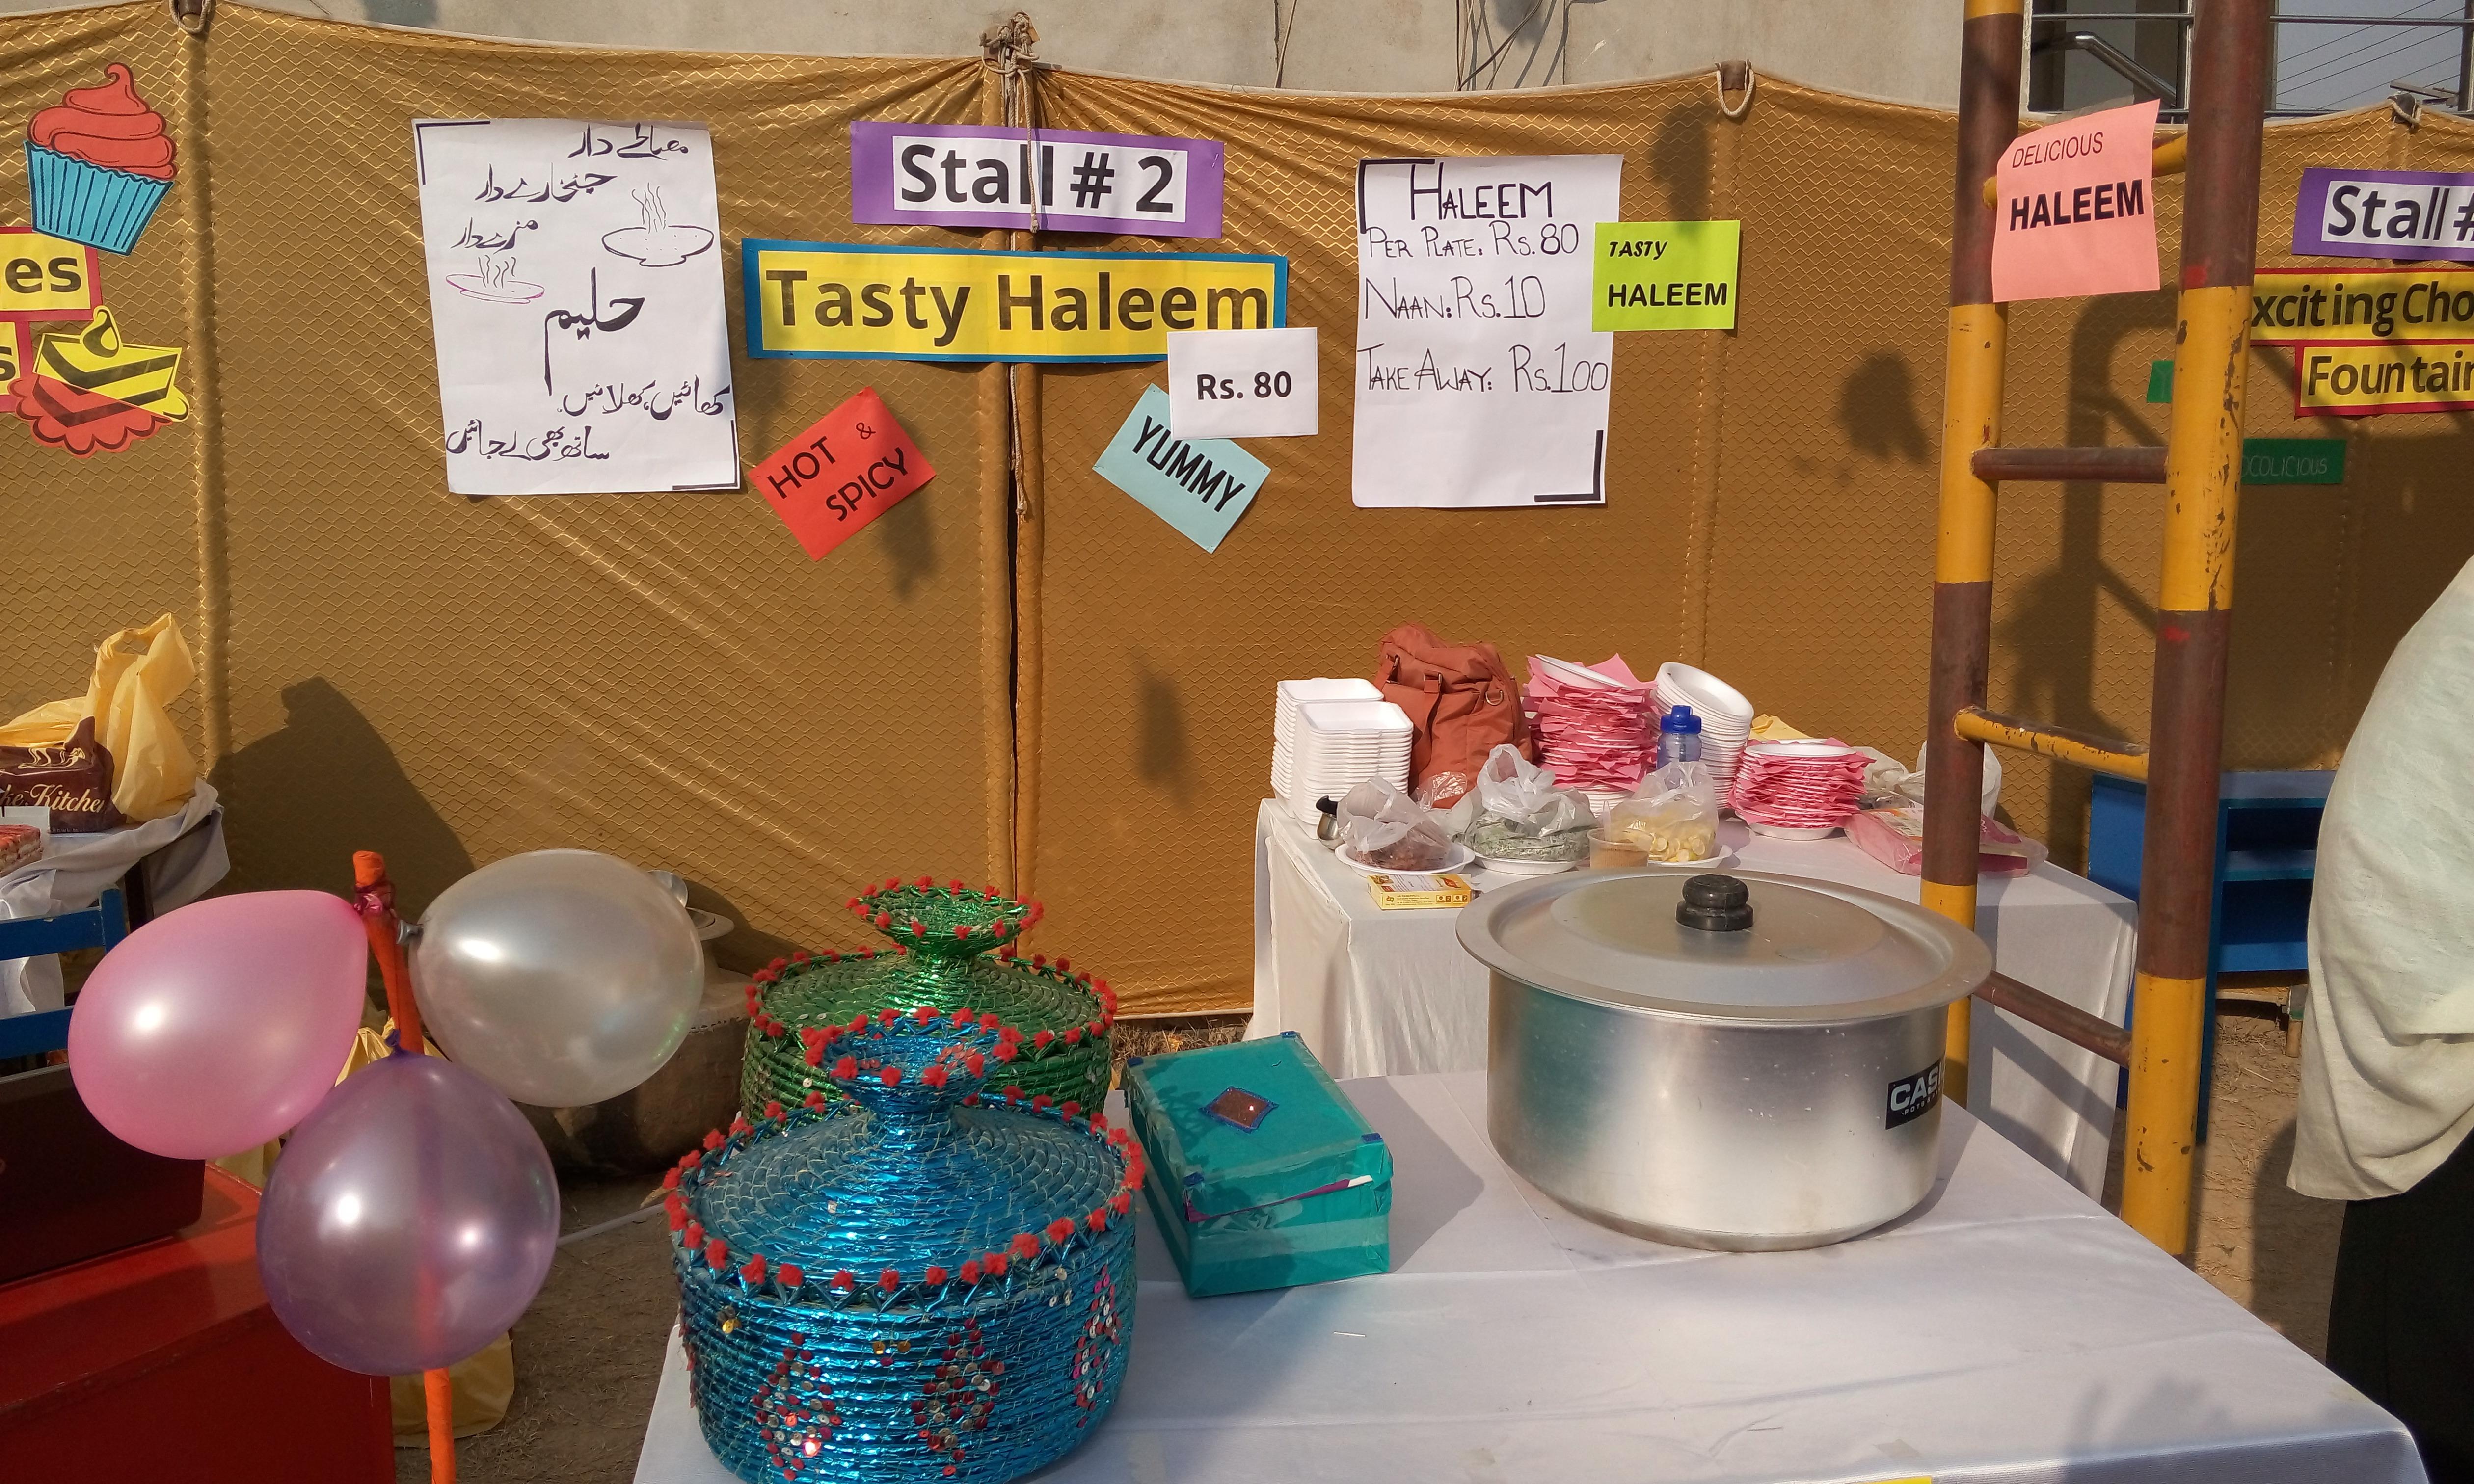 Stall 2 - Tasty Haleem